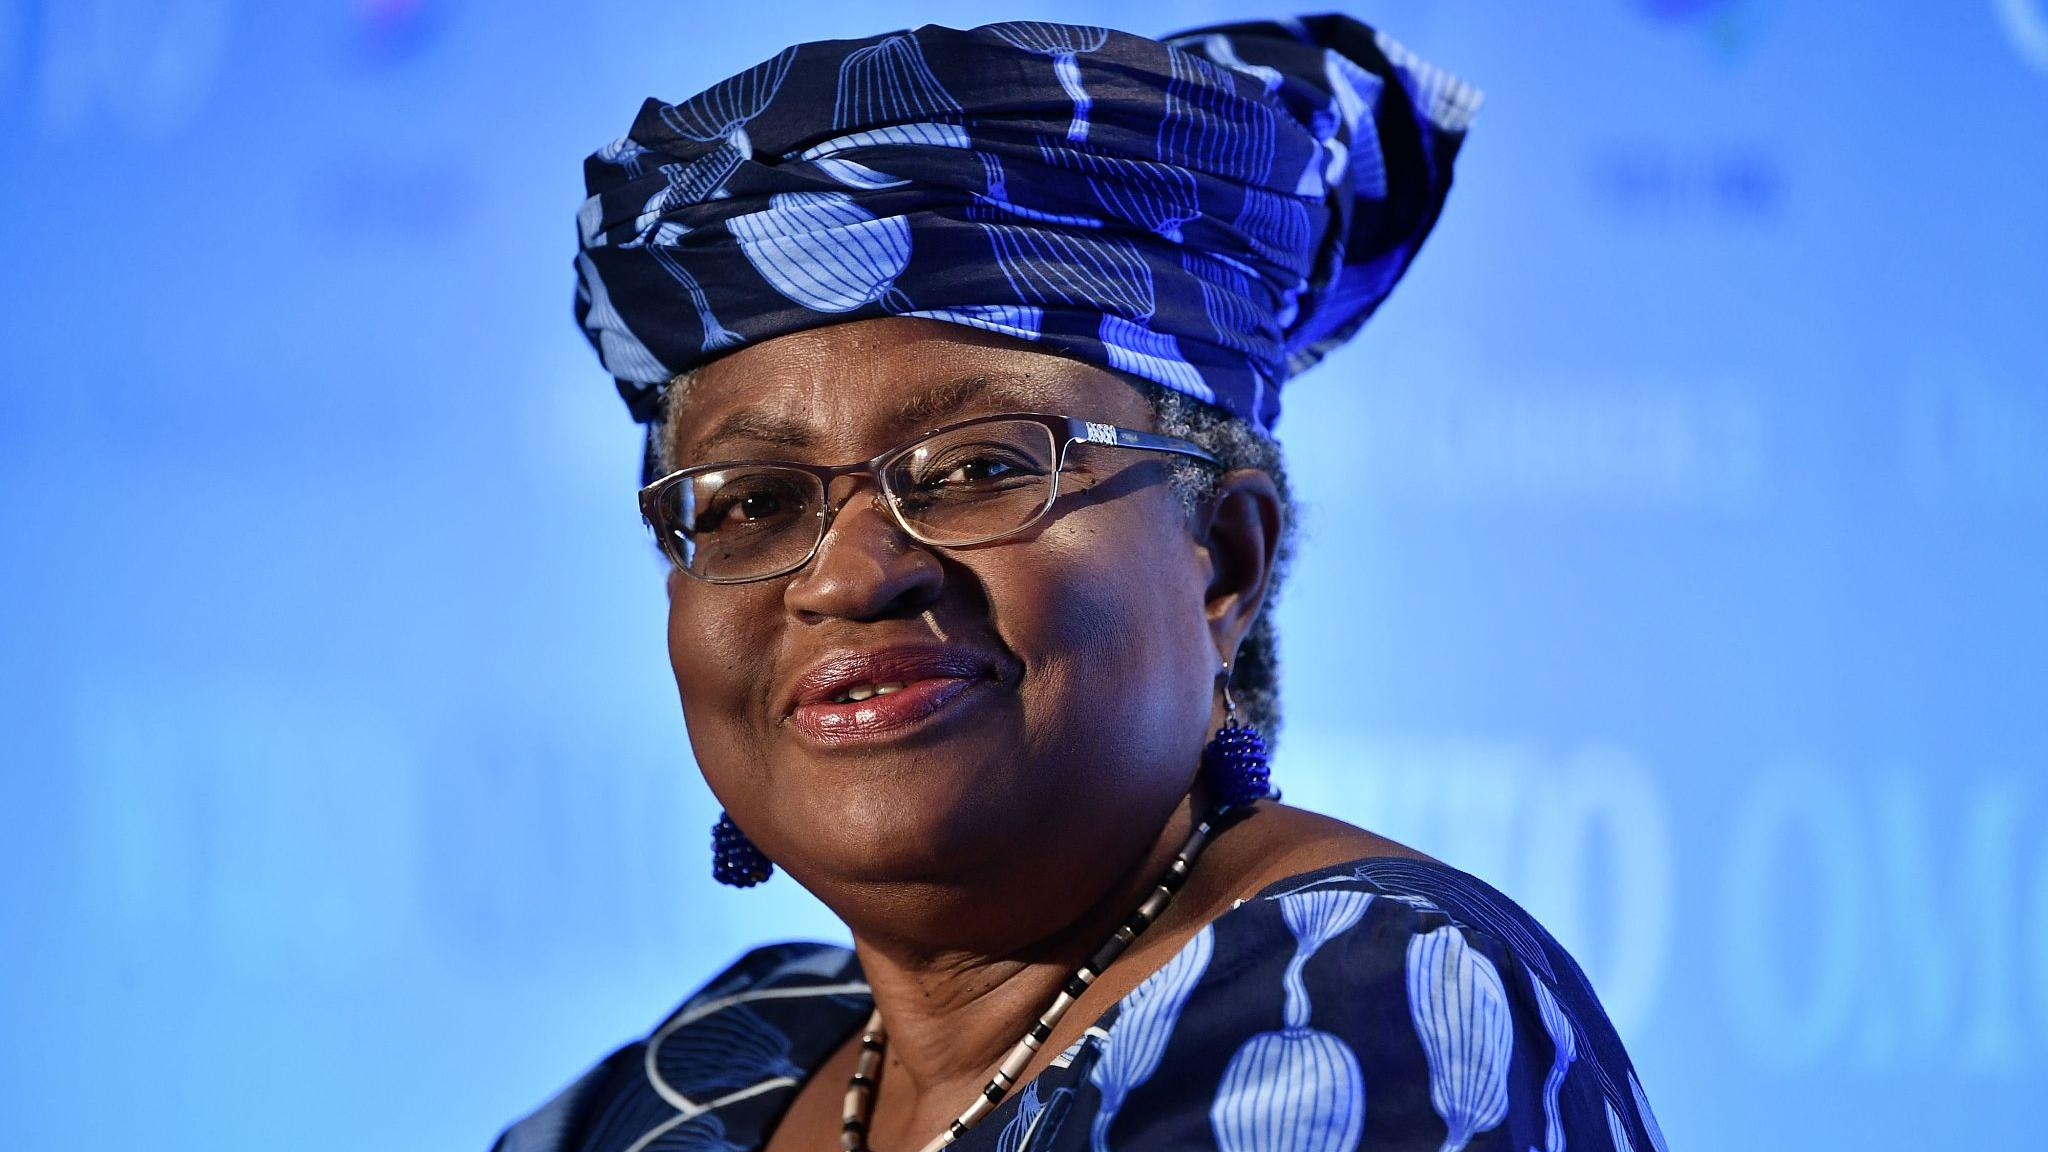 WTO appoints Nigeria's Ngozi Okonjo-Iweala as new director general